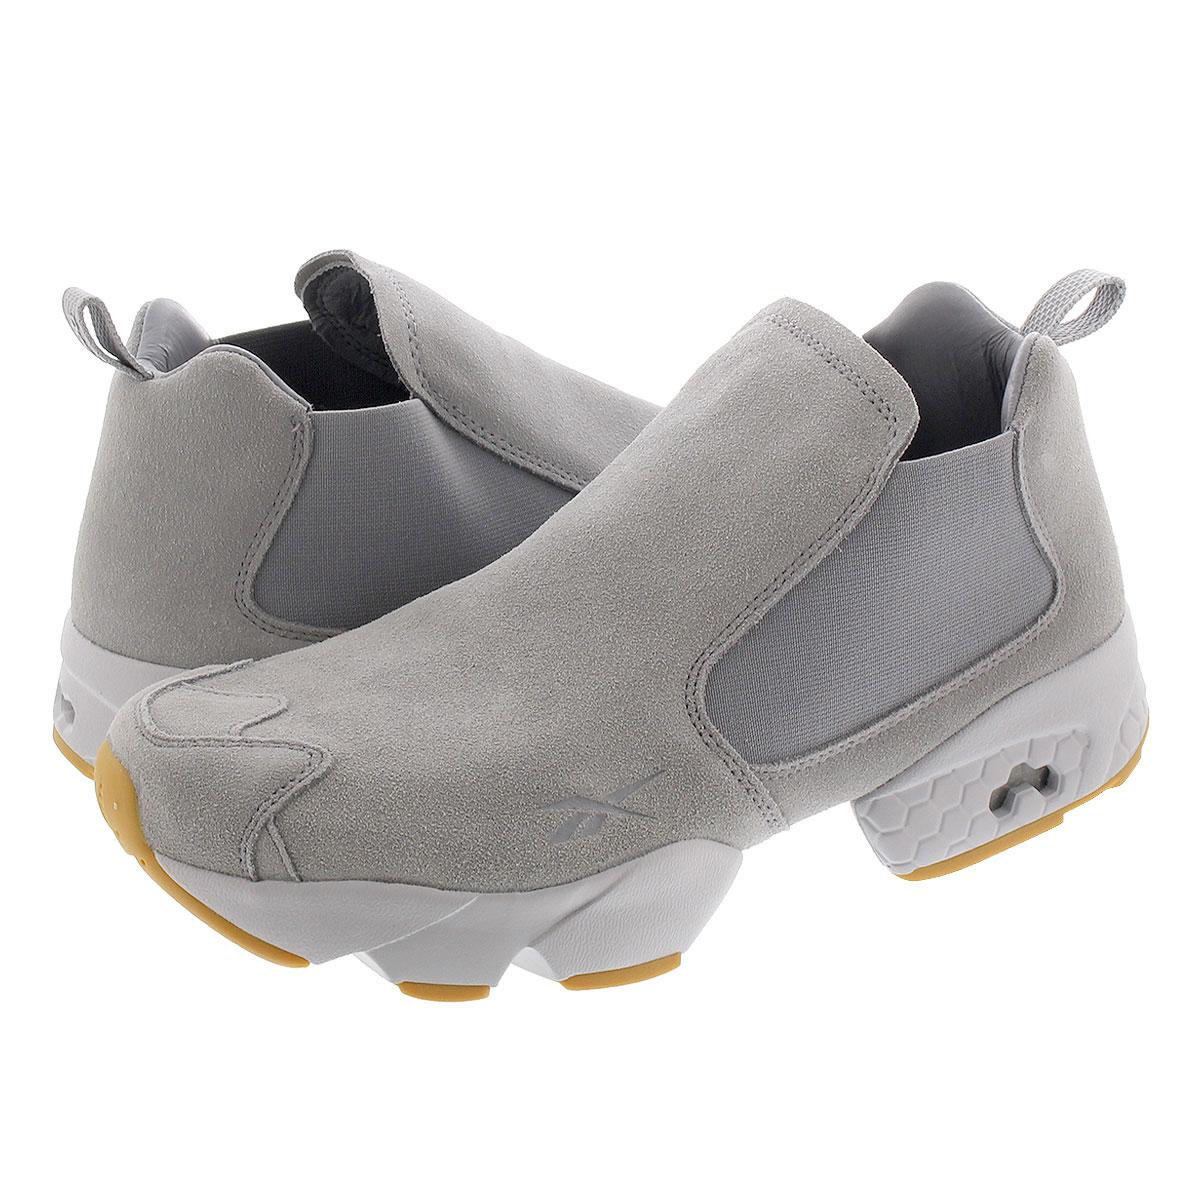 Reebok FURY CHELSEA BOOT リーボック フューリー チェルシー ブーツ COOL SHADOW/COLD GREY/GUM fv9203